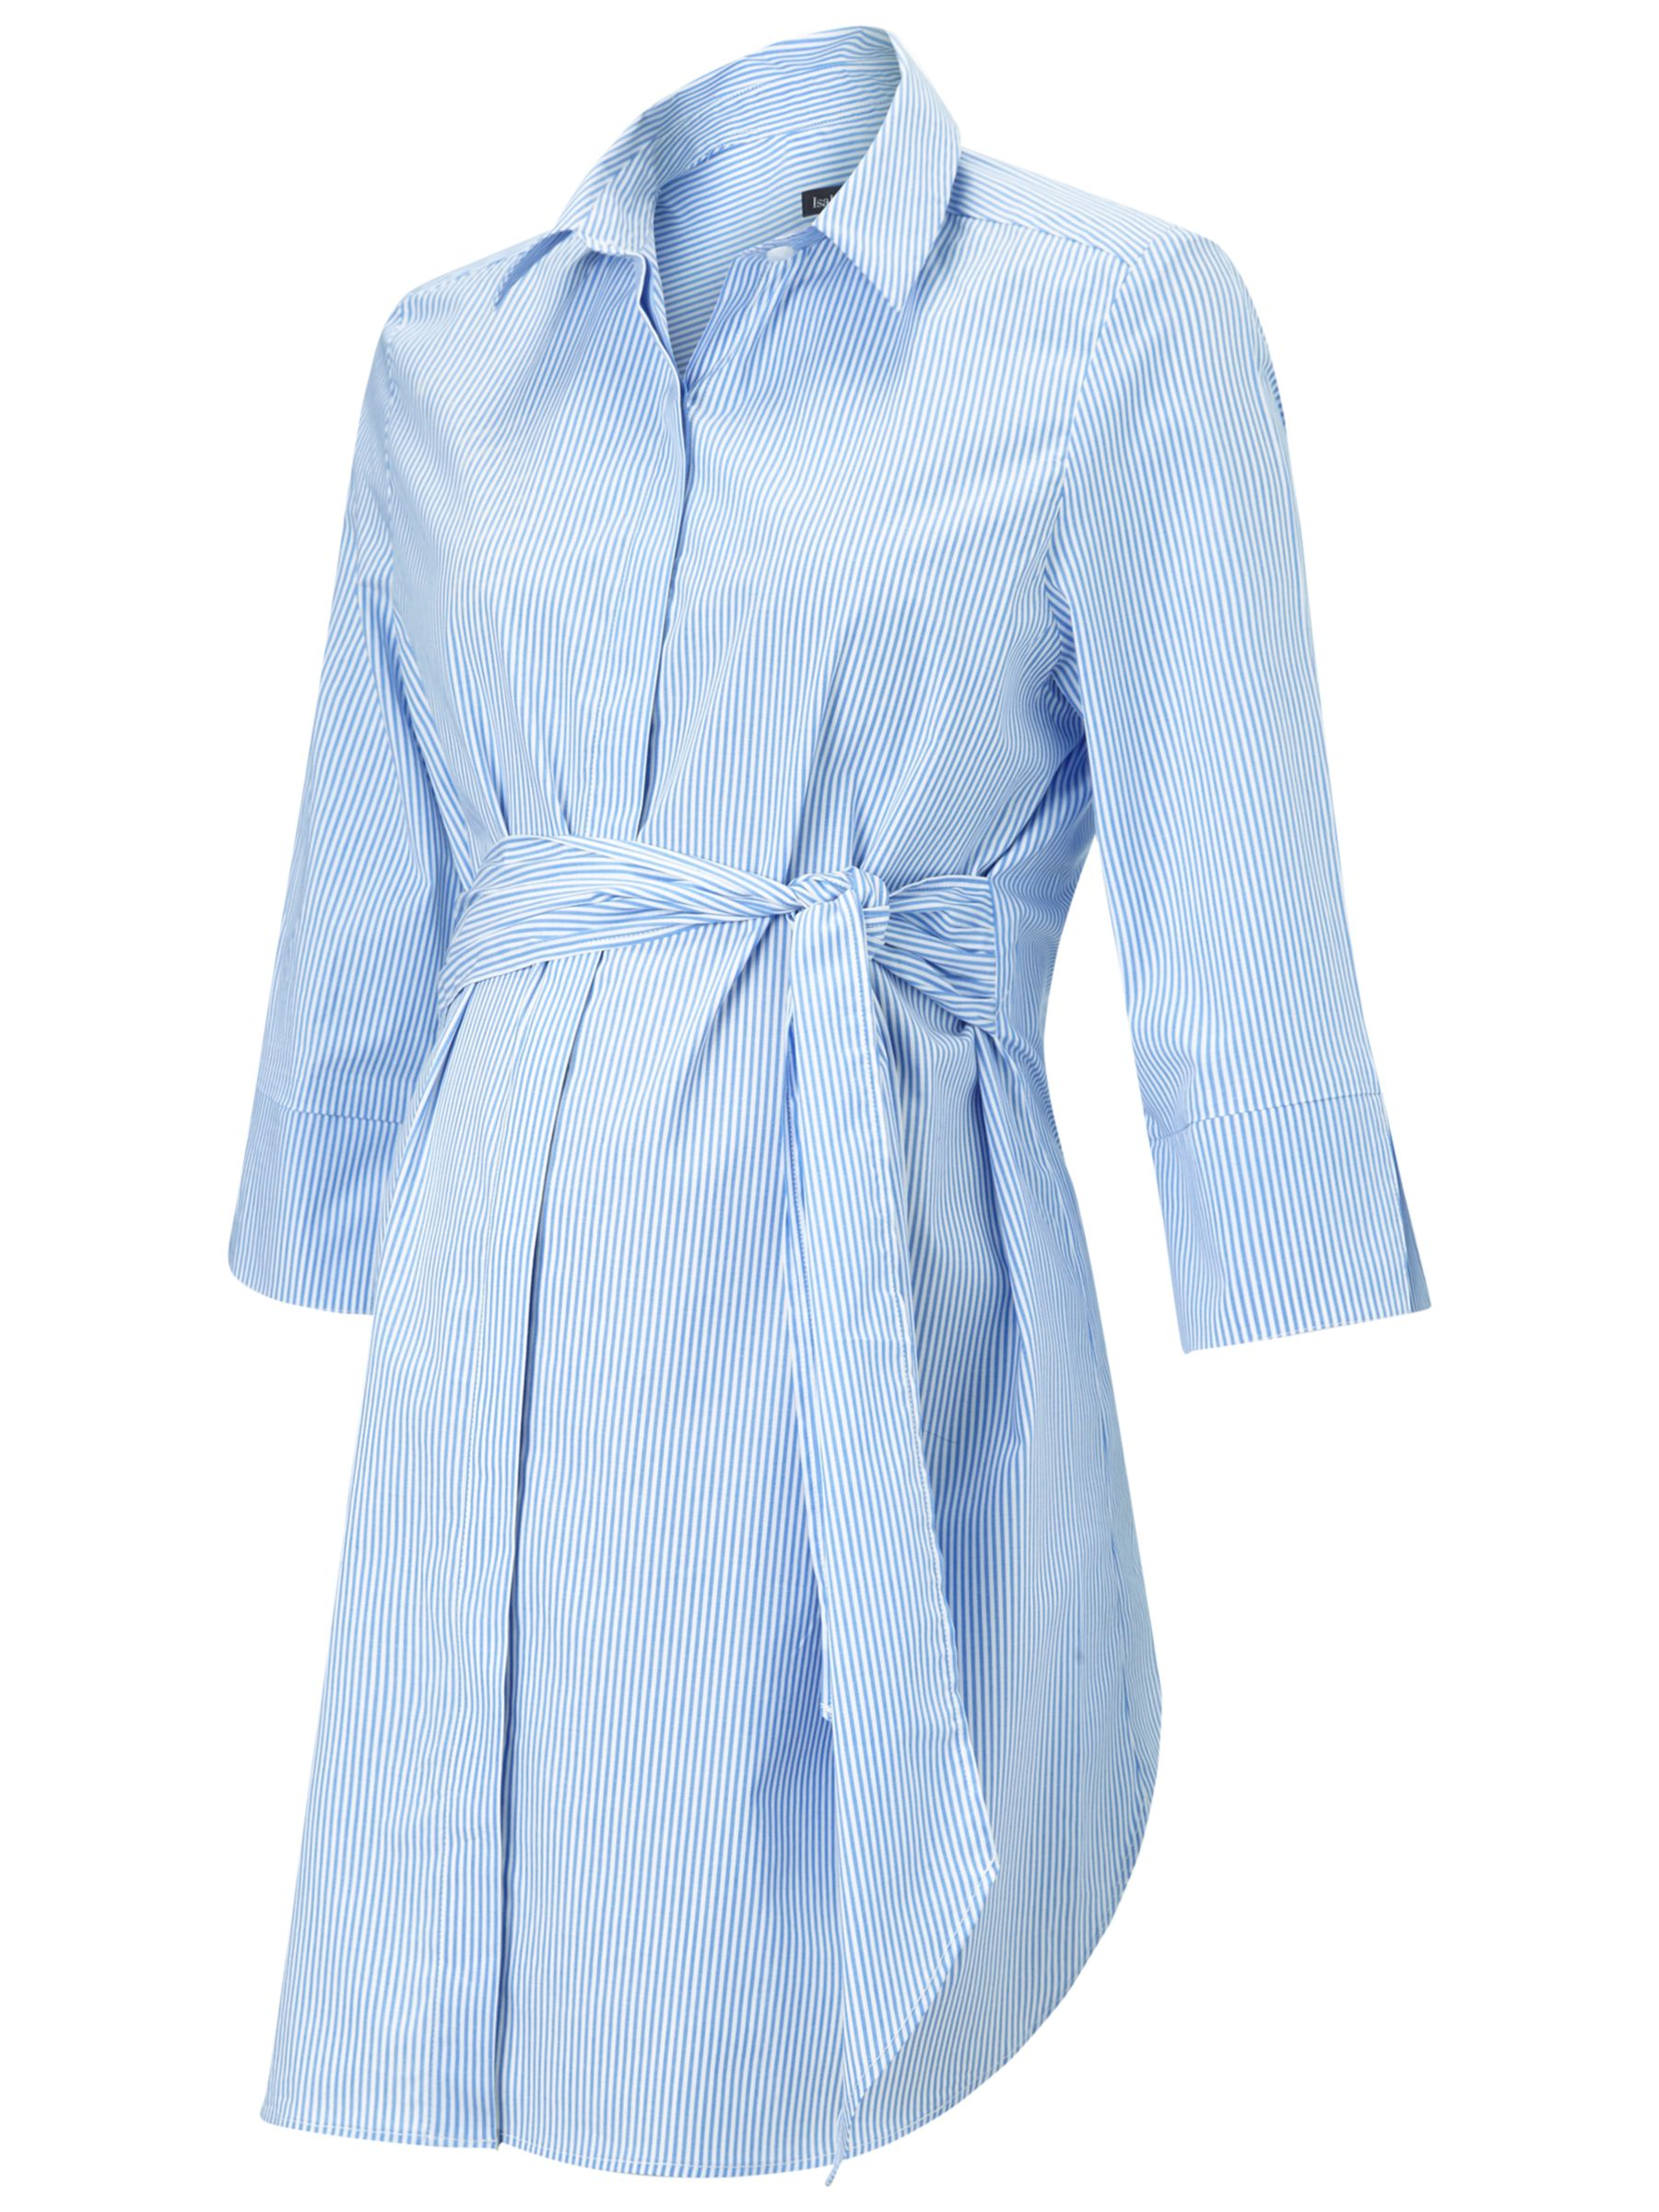 Isabella Oliver Isabella Oliver Dora Striped Maternity Shirt, Blue/White